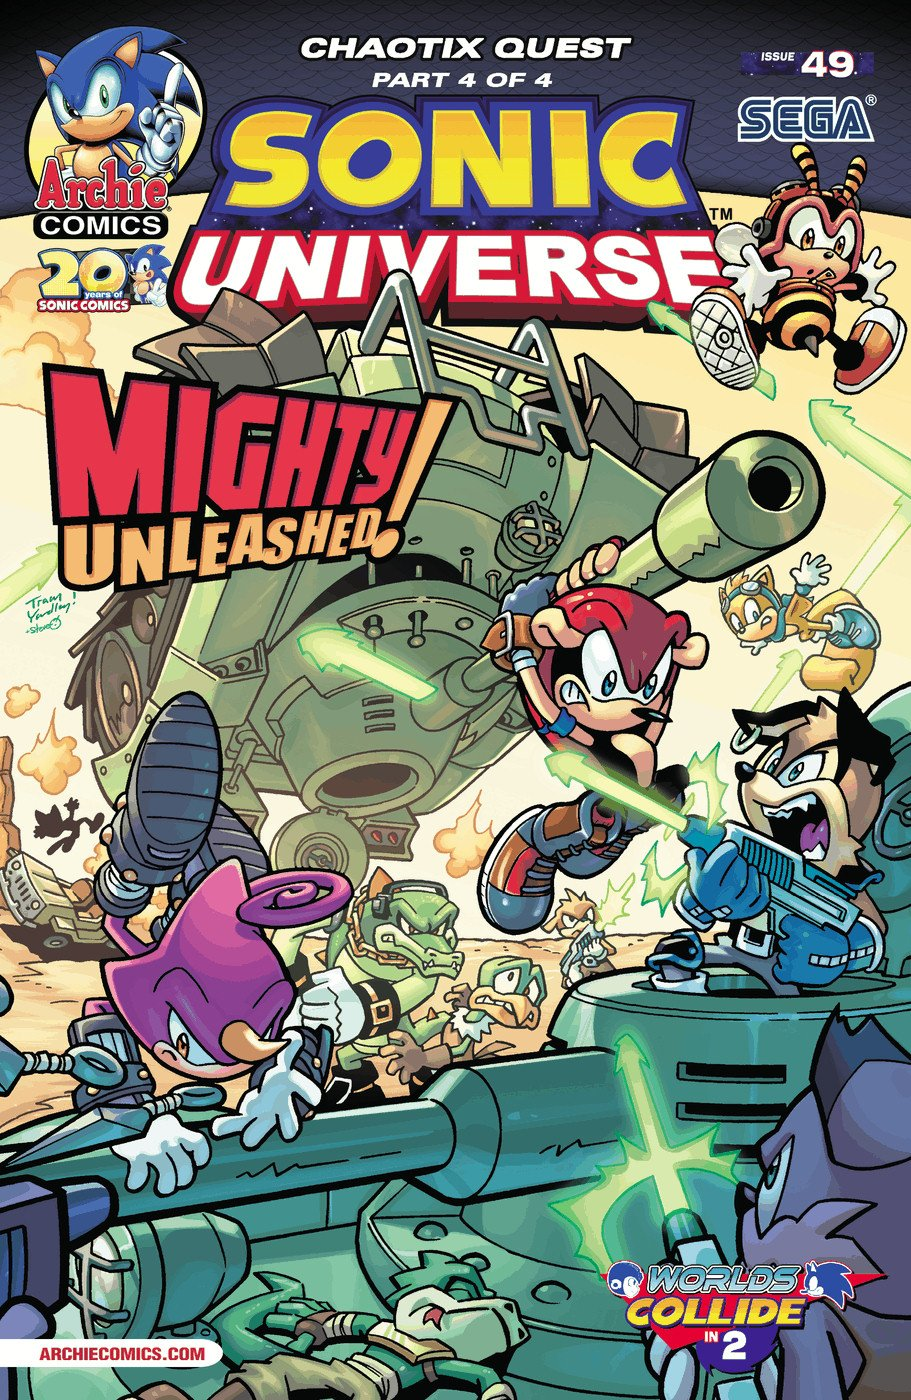 Sonic Universe 049 (April 2013)